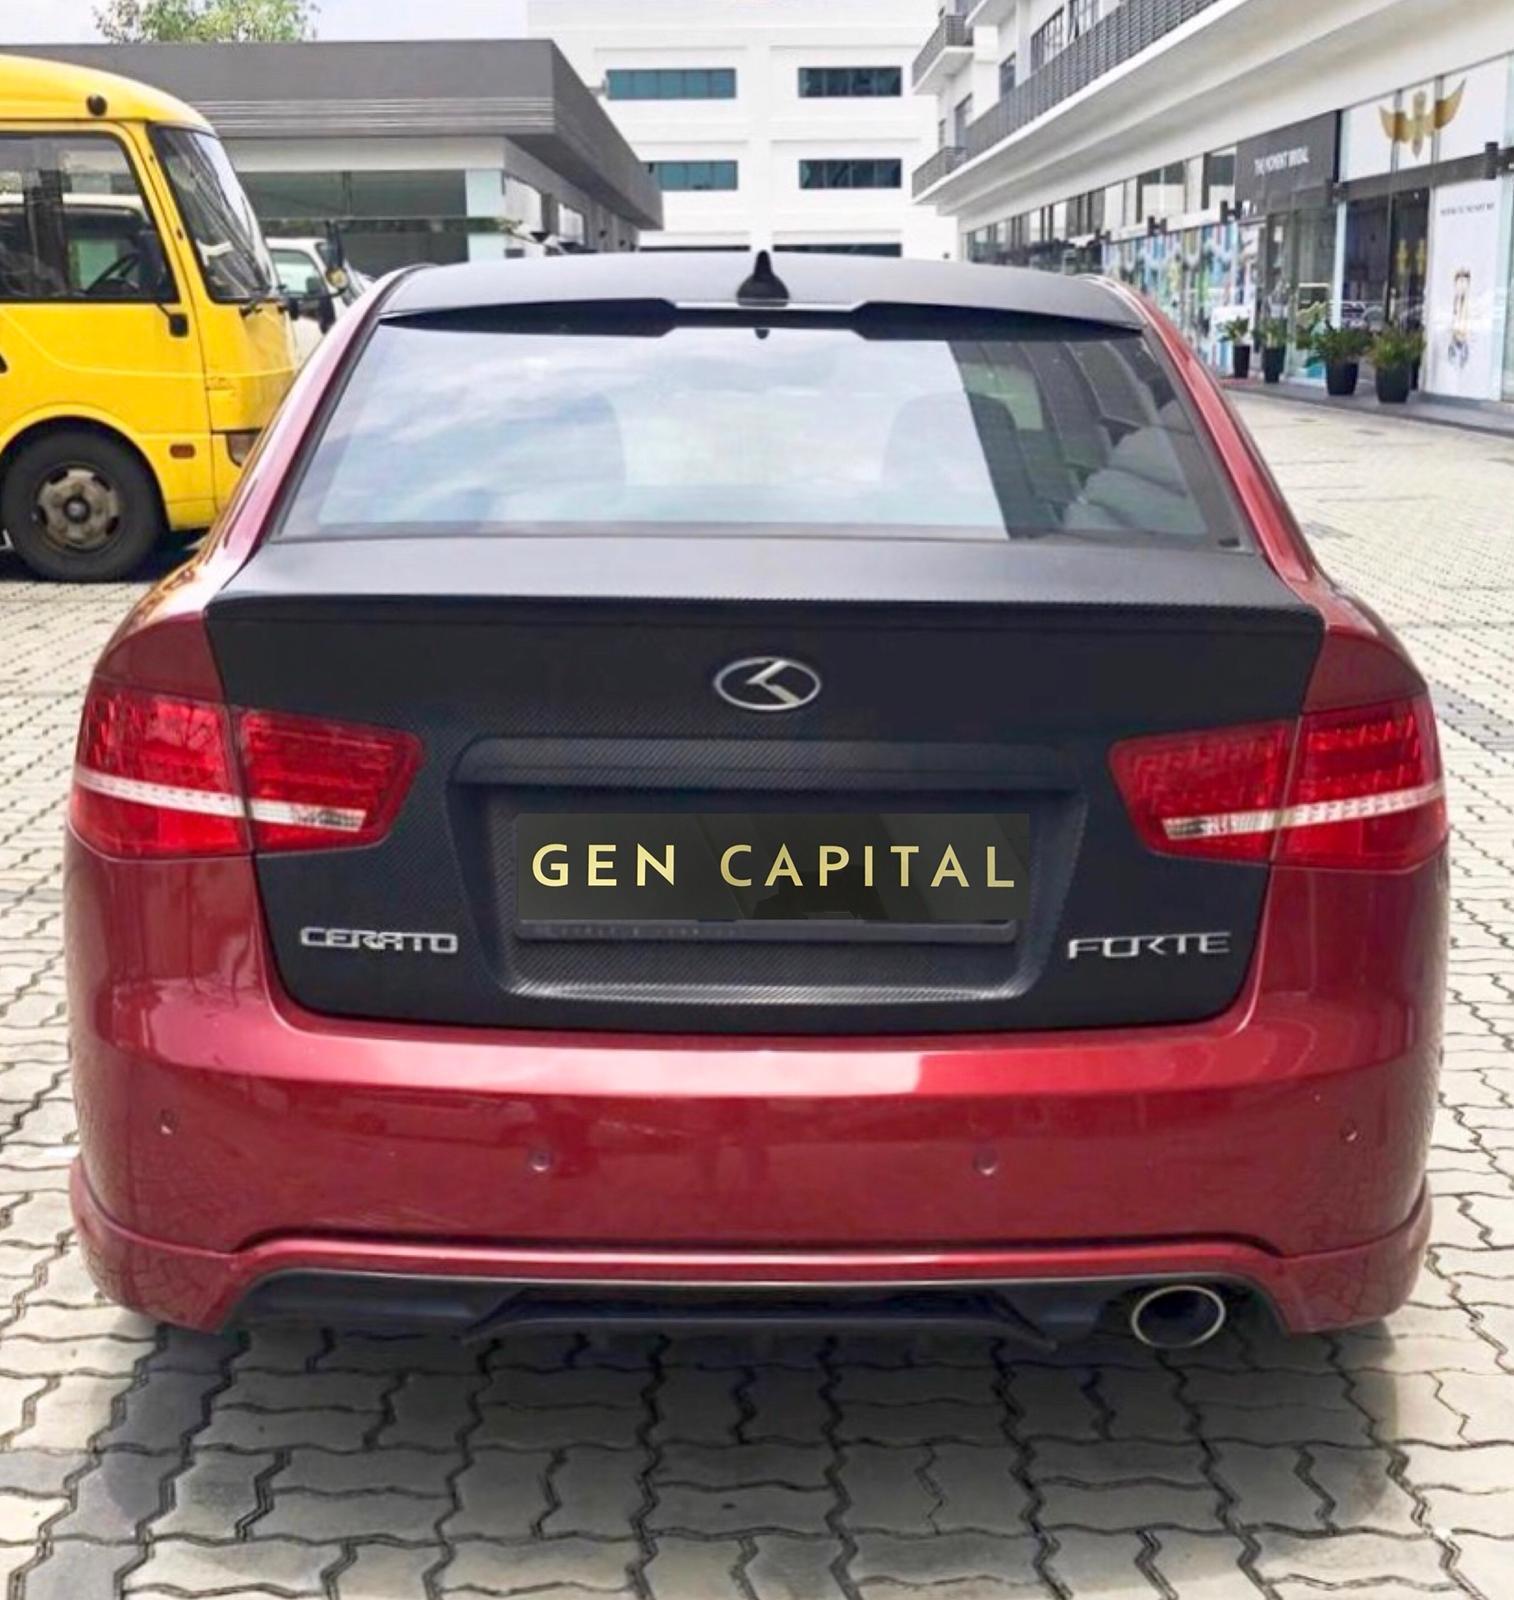 Kia Cerato Forte 1.6A  Grab Gojek Ryde Tada & Non PHV Car Rental in Singapore!